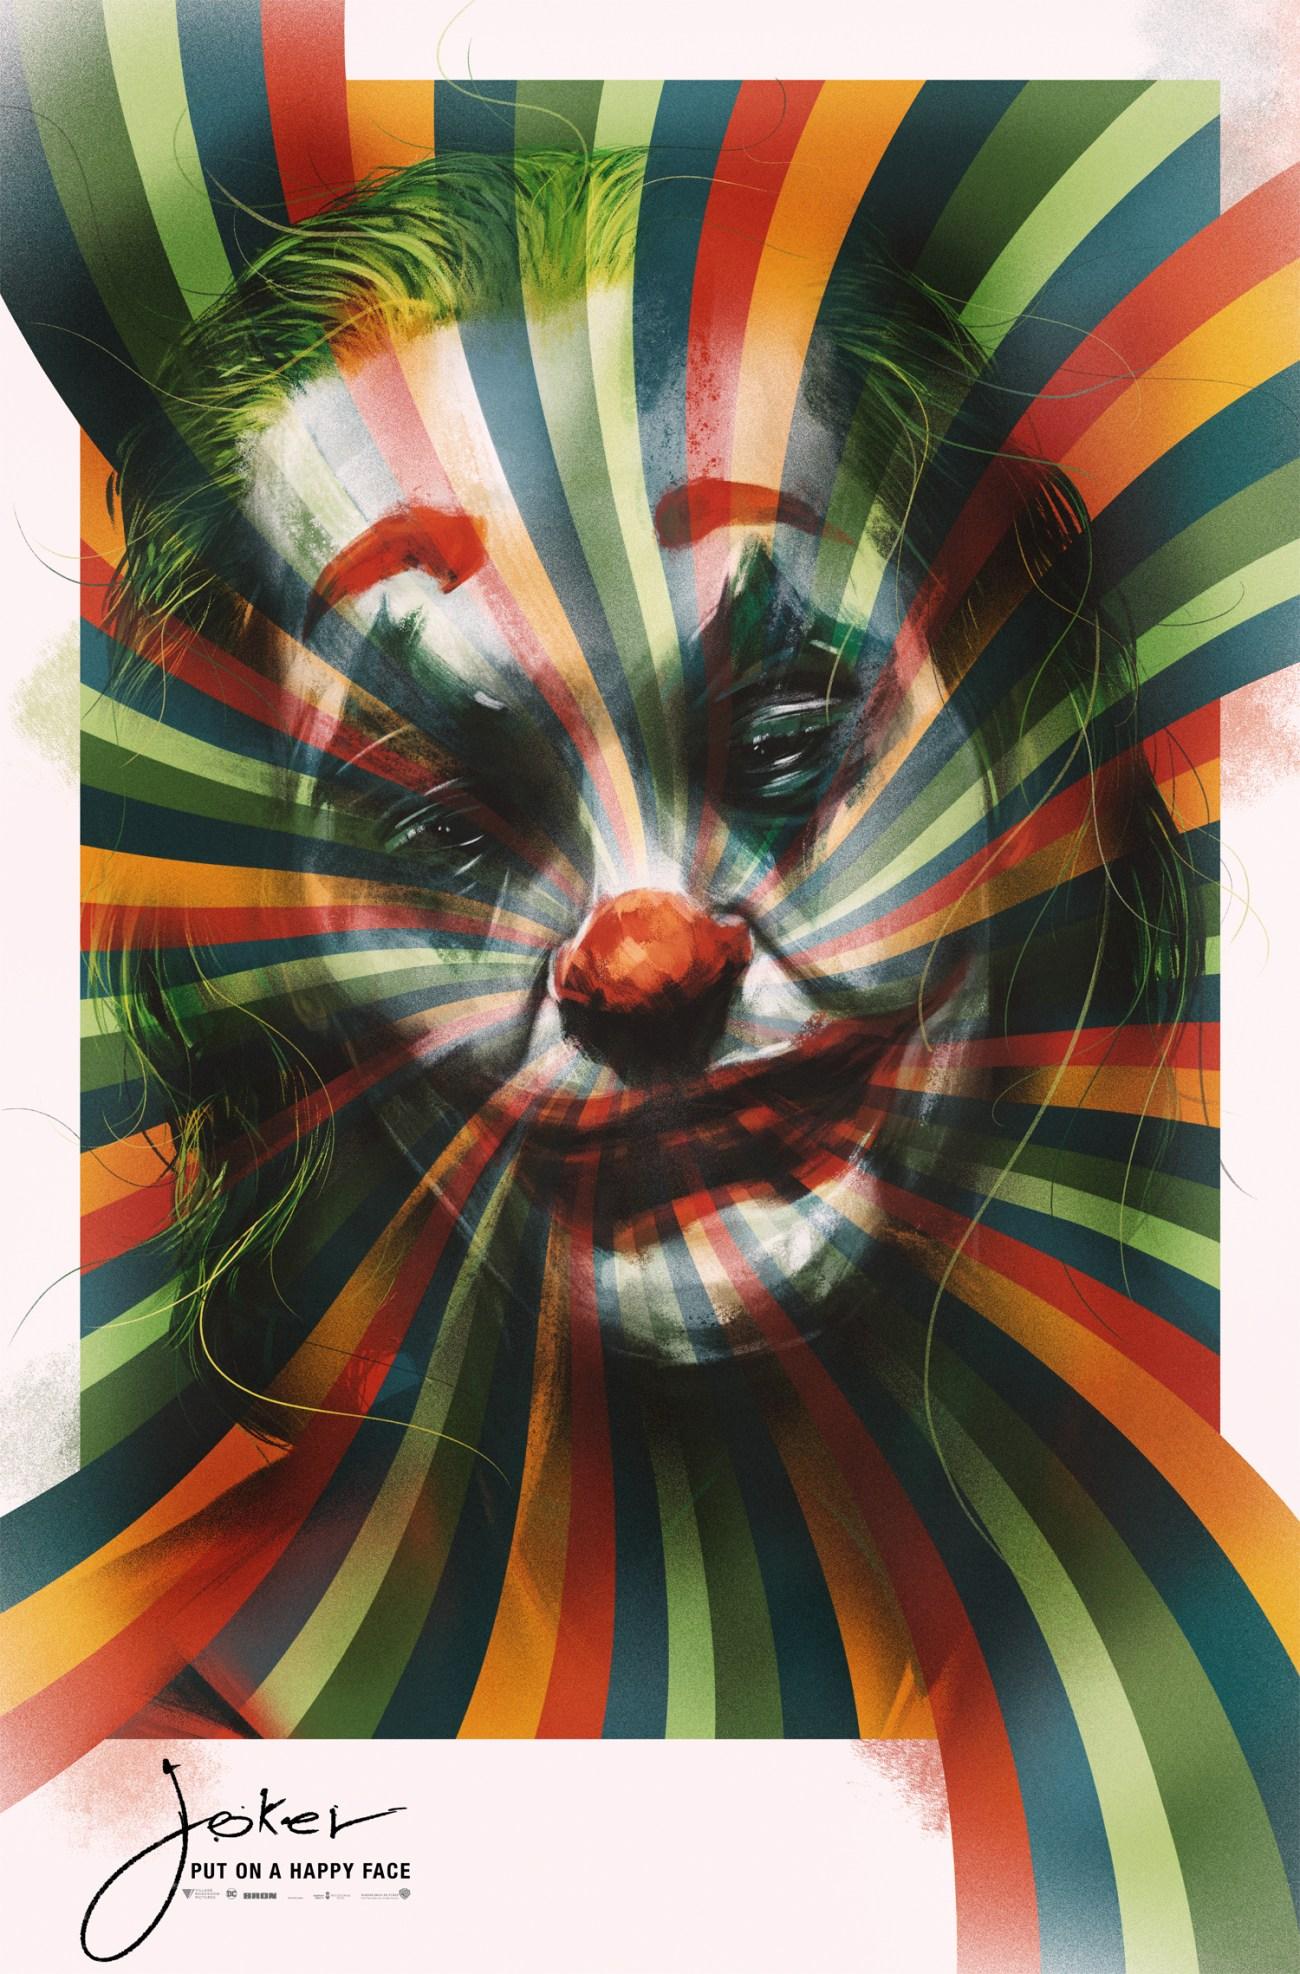 Póster de Joker (2019) por Luke Butland. Imagen: Collider.com